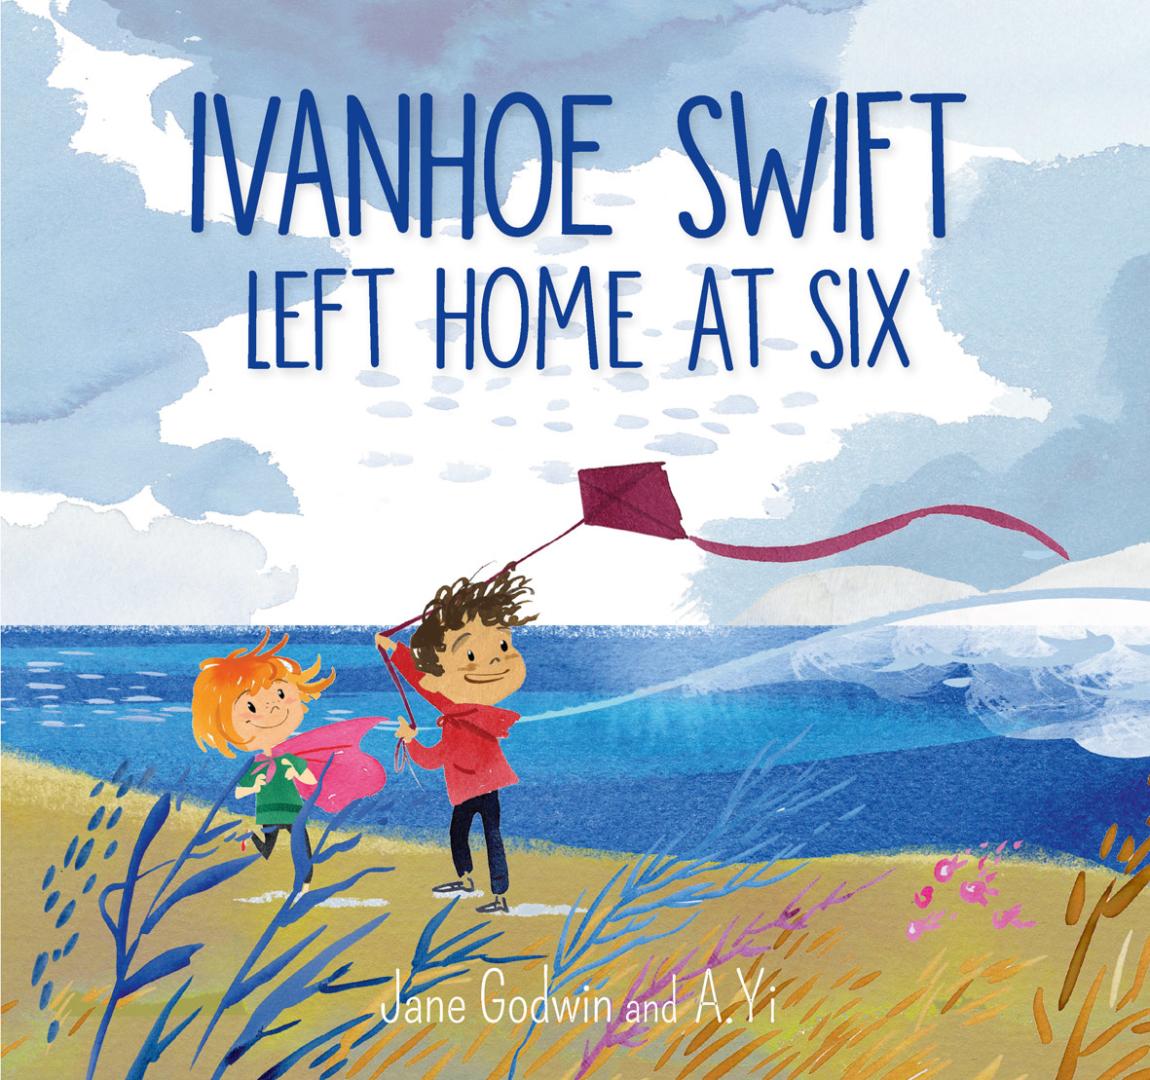 Ivanhoe-Swift